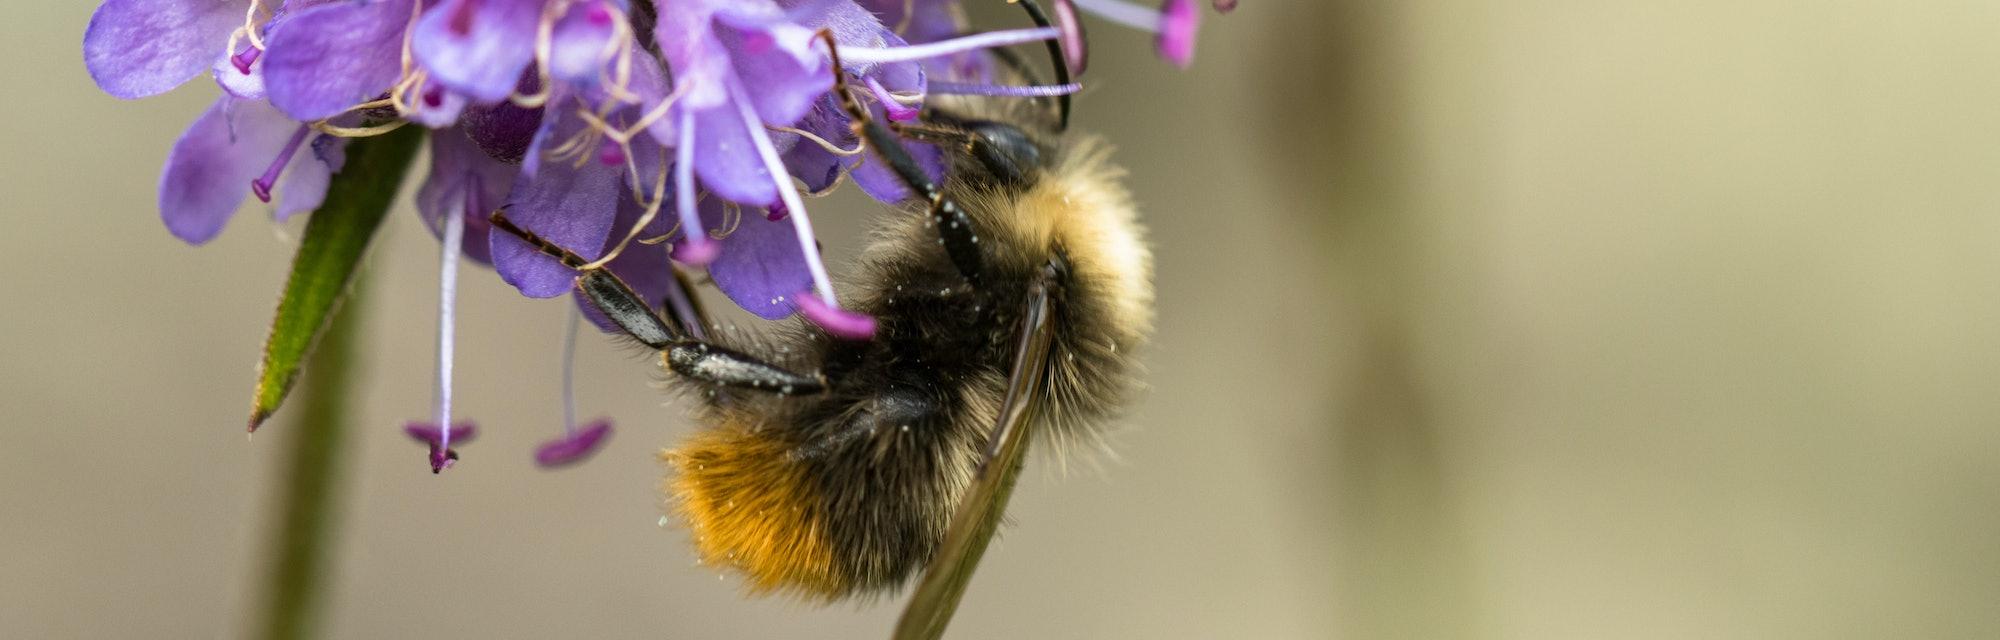 Early Bumblebee or early-nesting bumblebee, Bombus pratorum, male sitting on devils bit scabious, Succisa pratensis